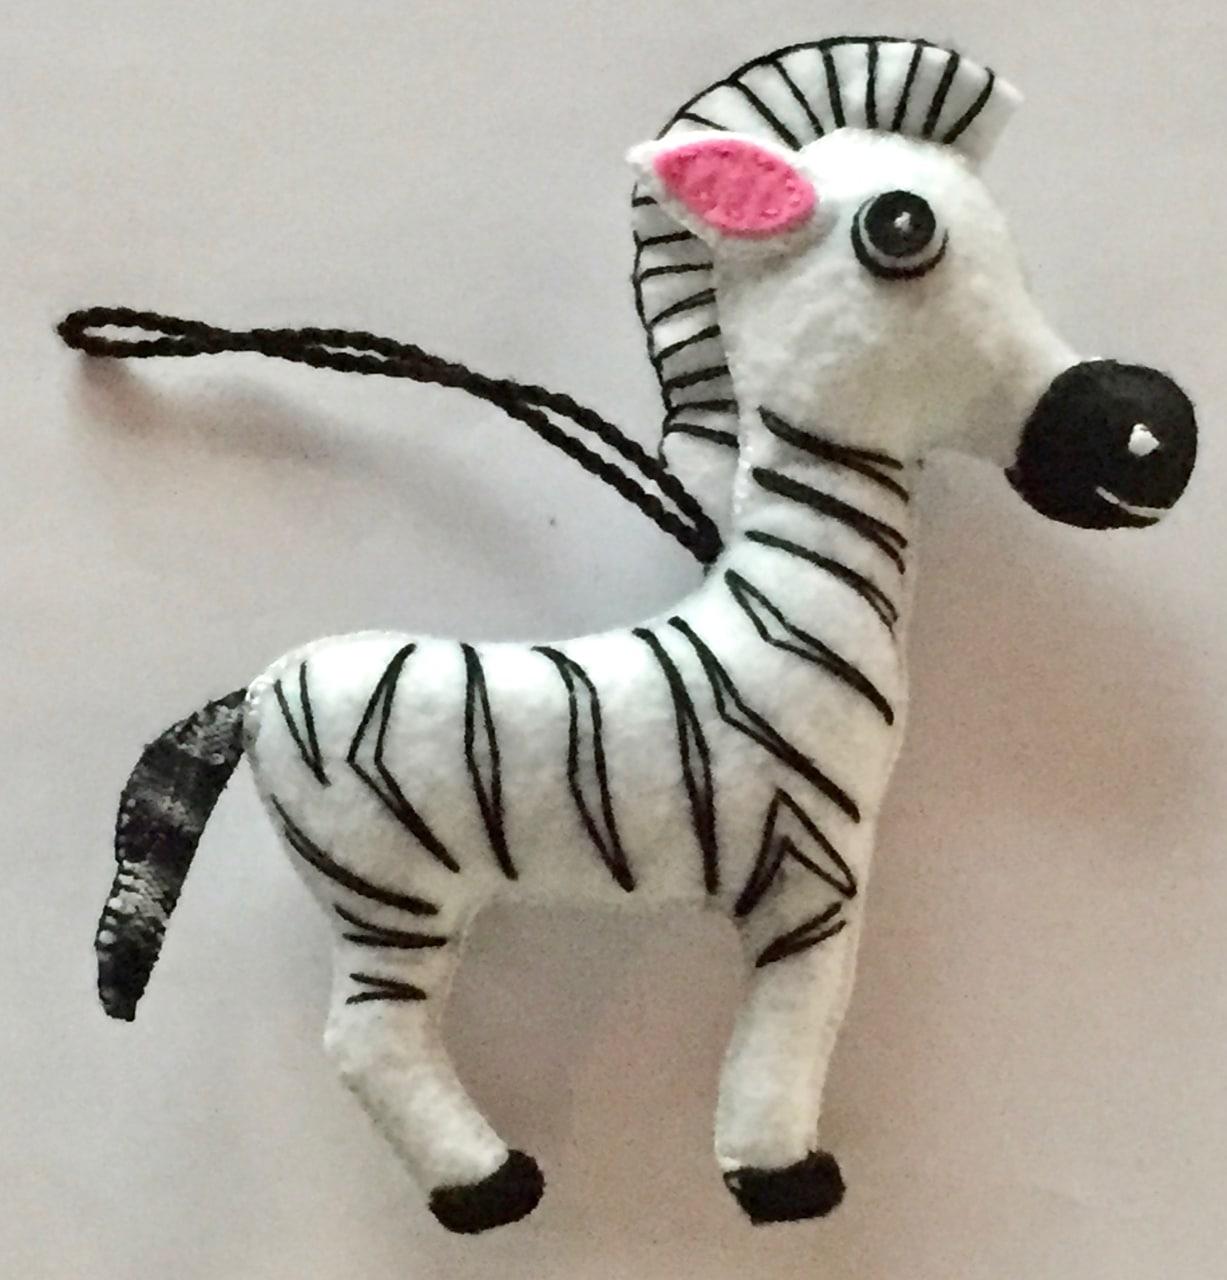 Zebra Ornament - Felt and Repurposed Traditional Fabric